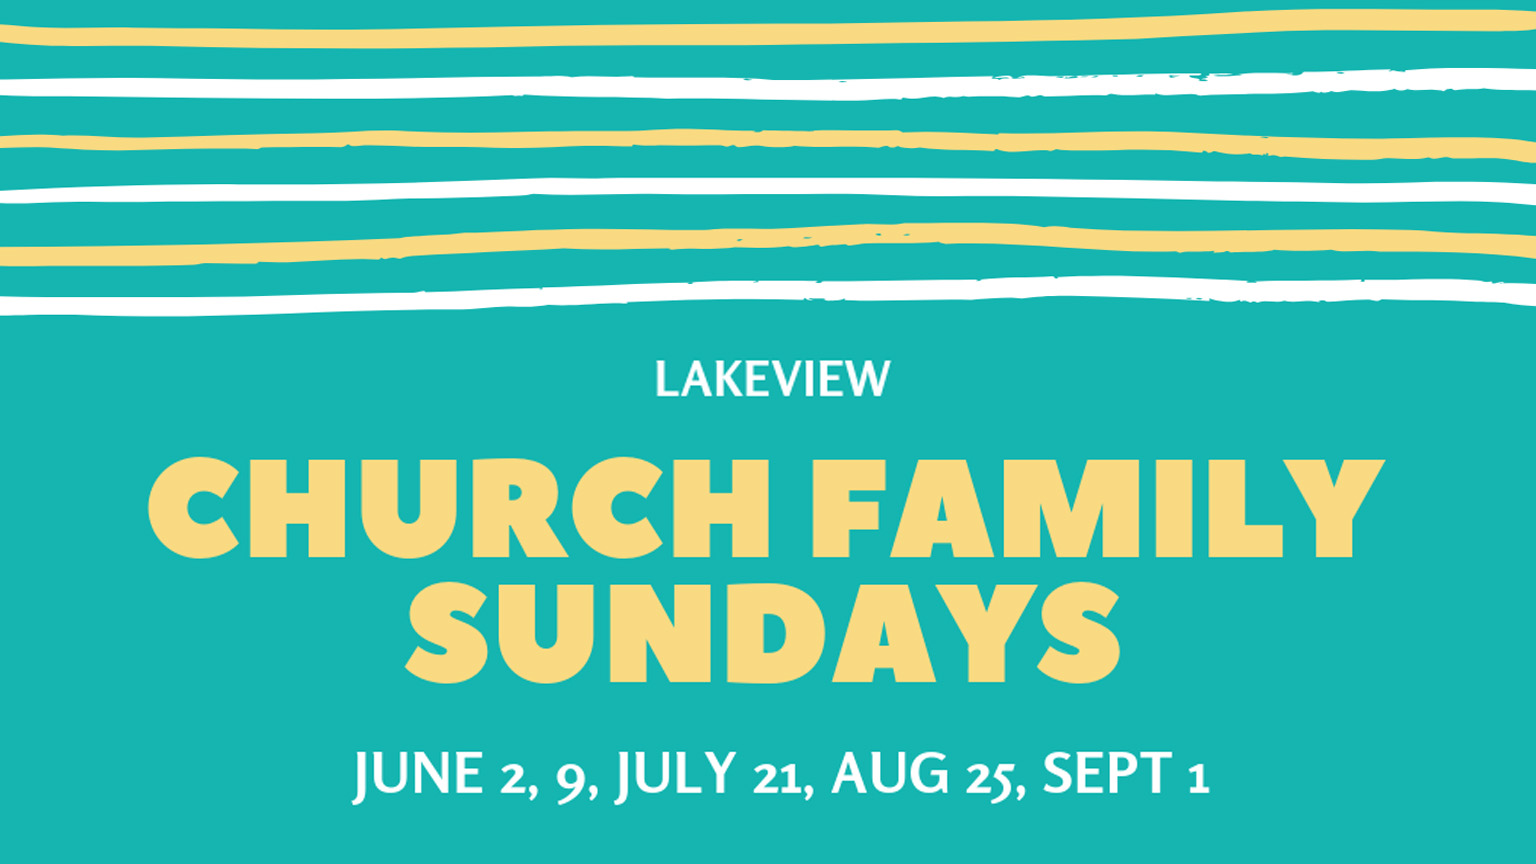 church family sundays.jpg